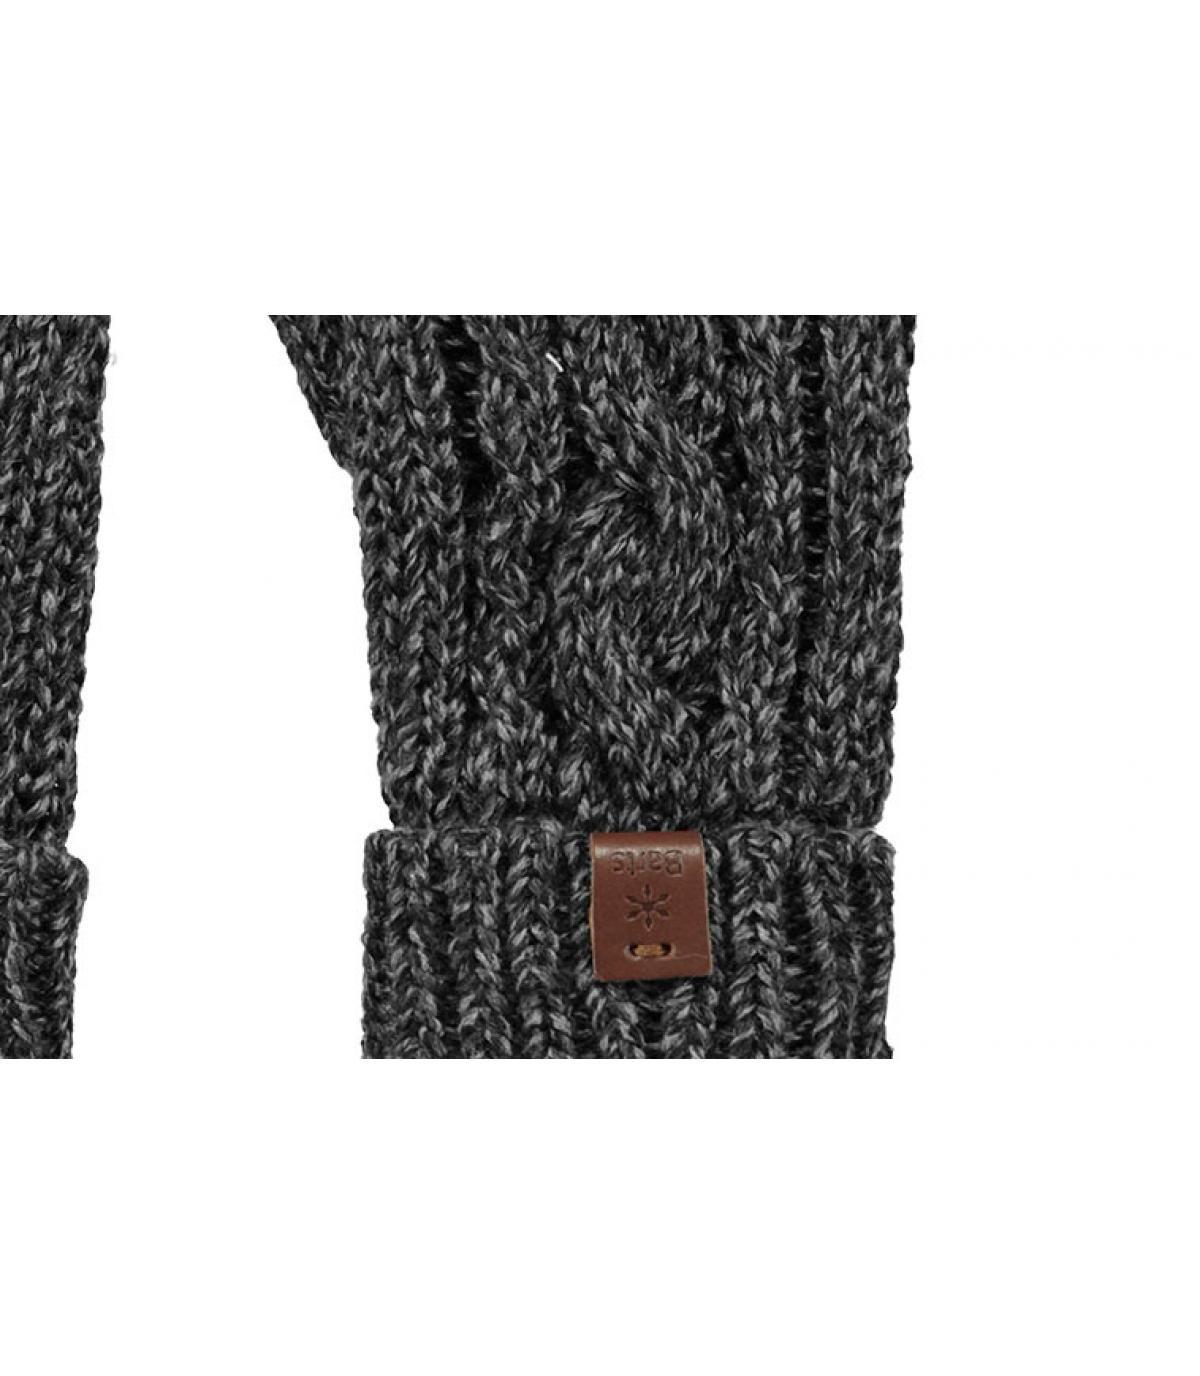 Détails Twister Gloves black - image 3